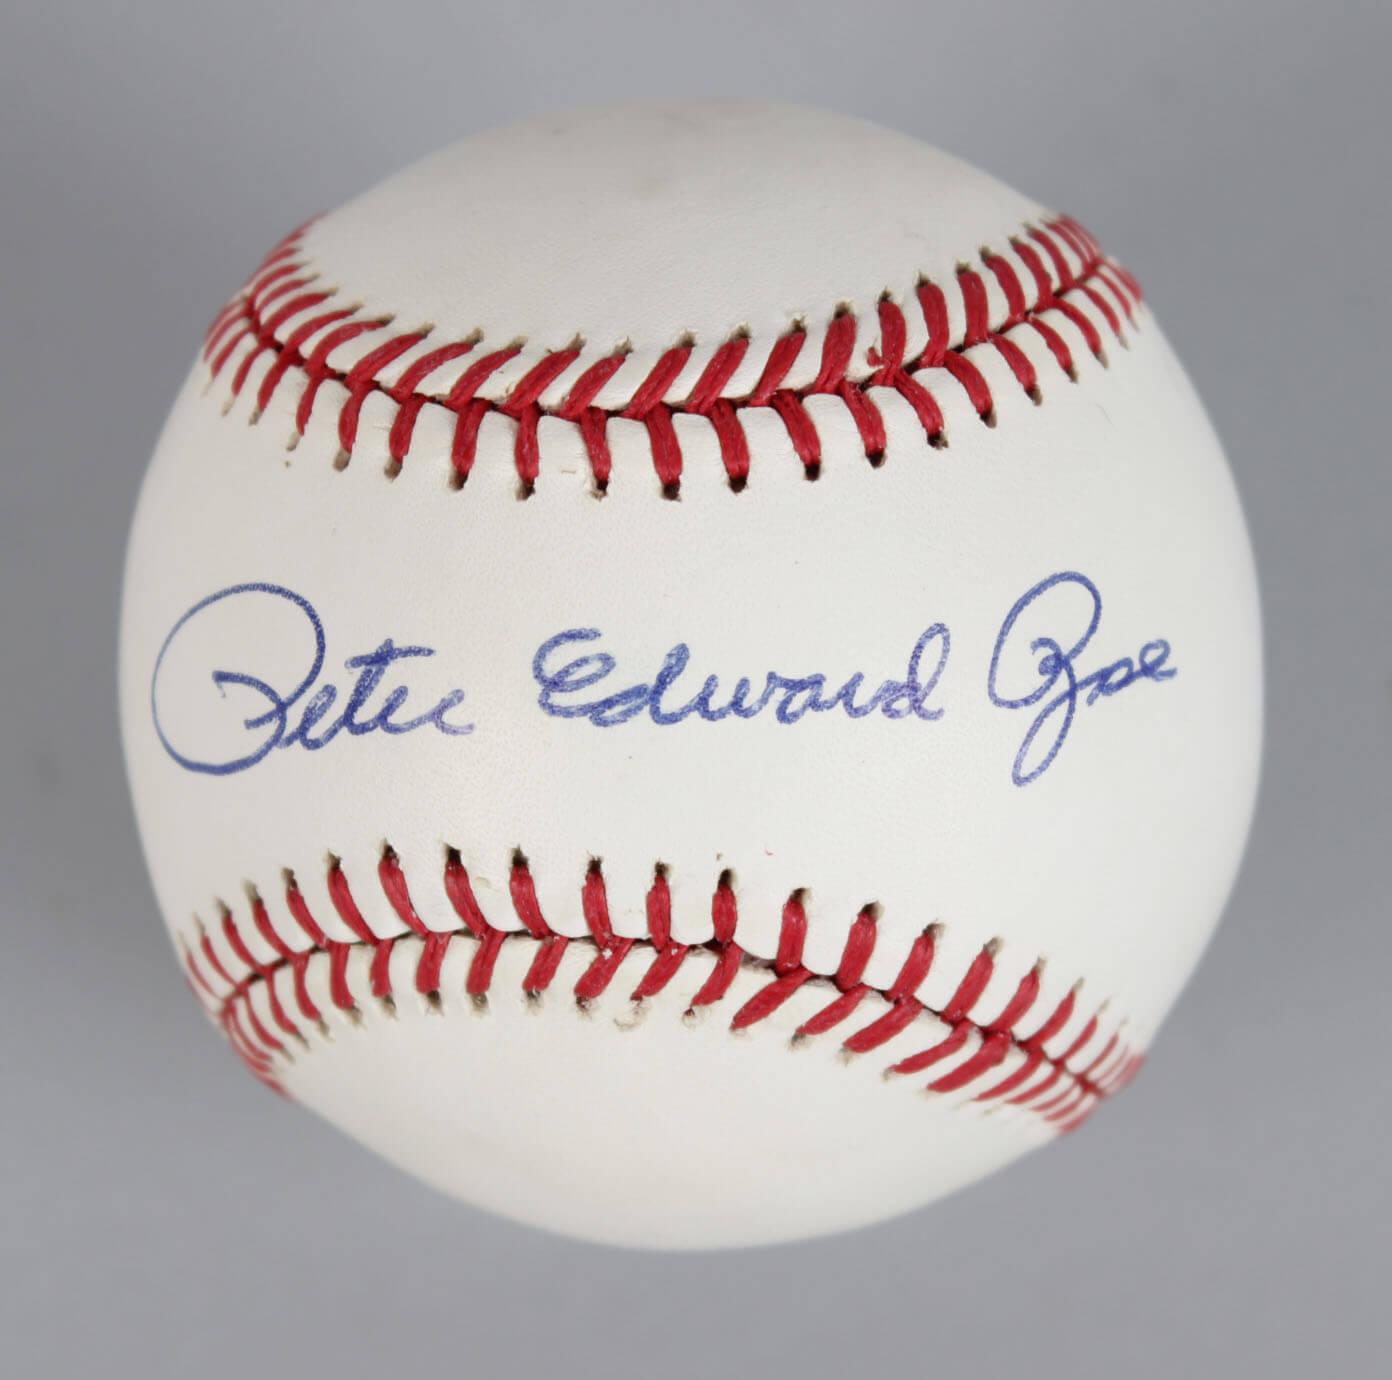 Cincinnati Reds – Pete Edward Rose Signed ONL Baseball- COA JSA59386_01